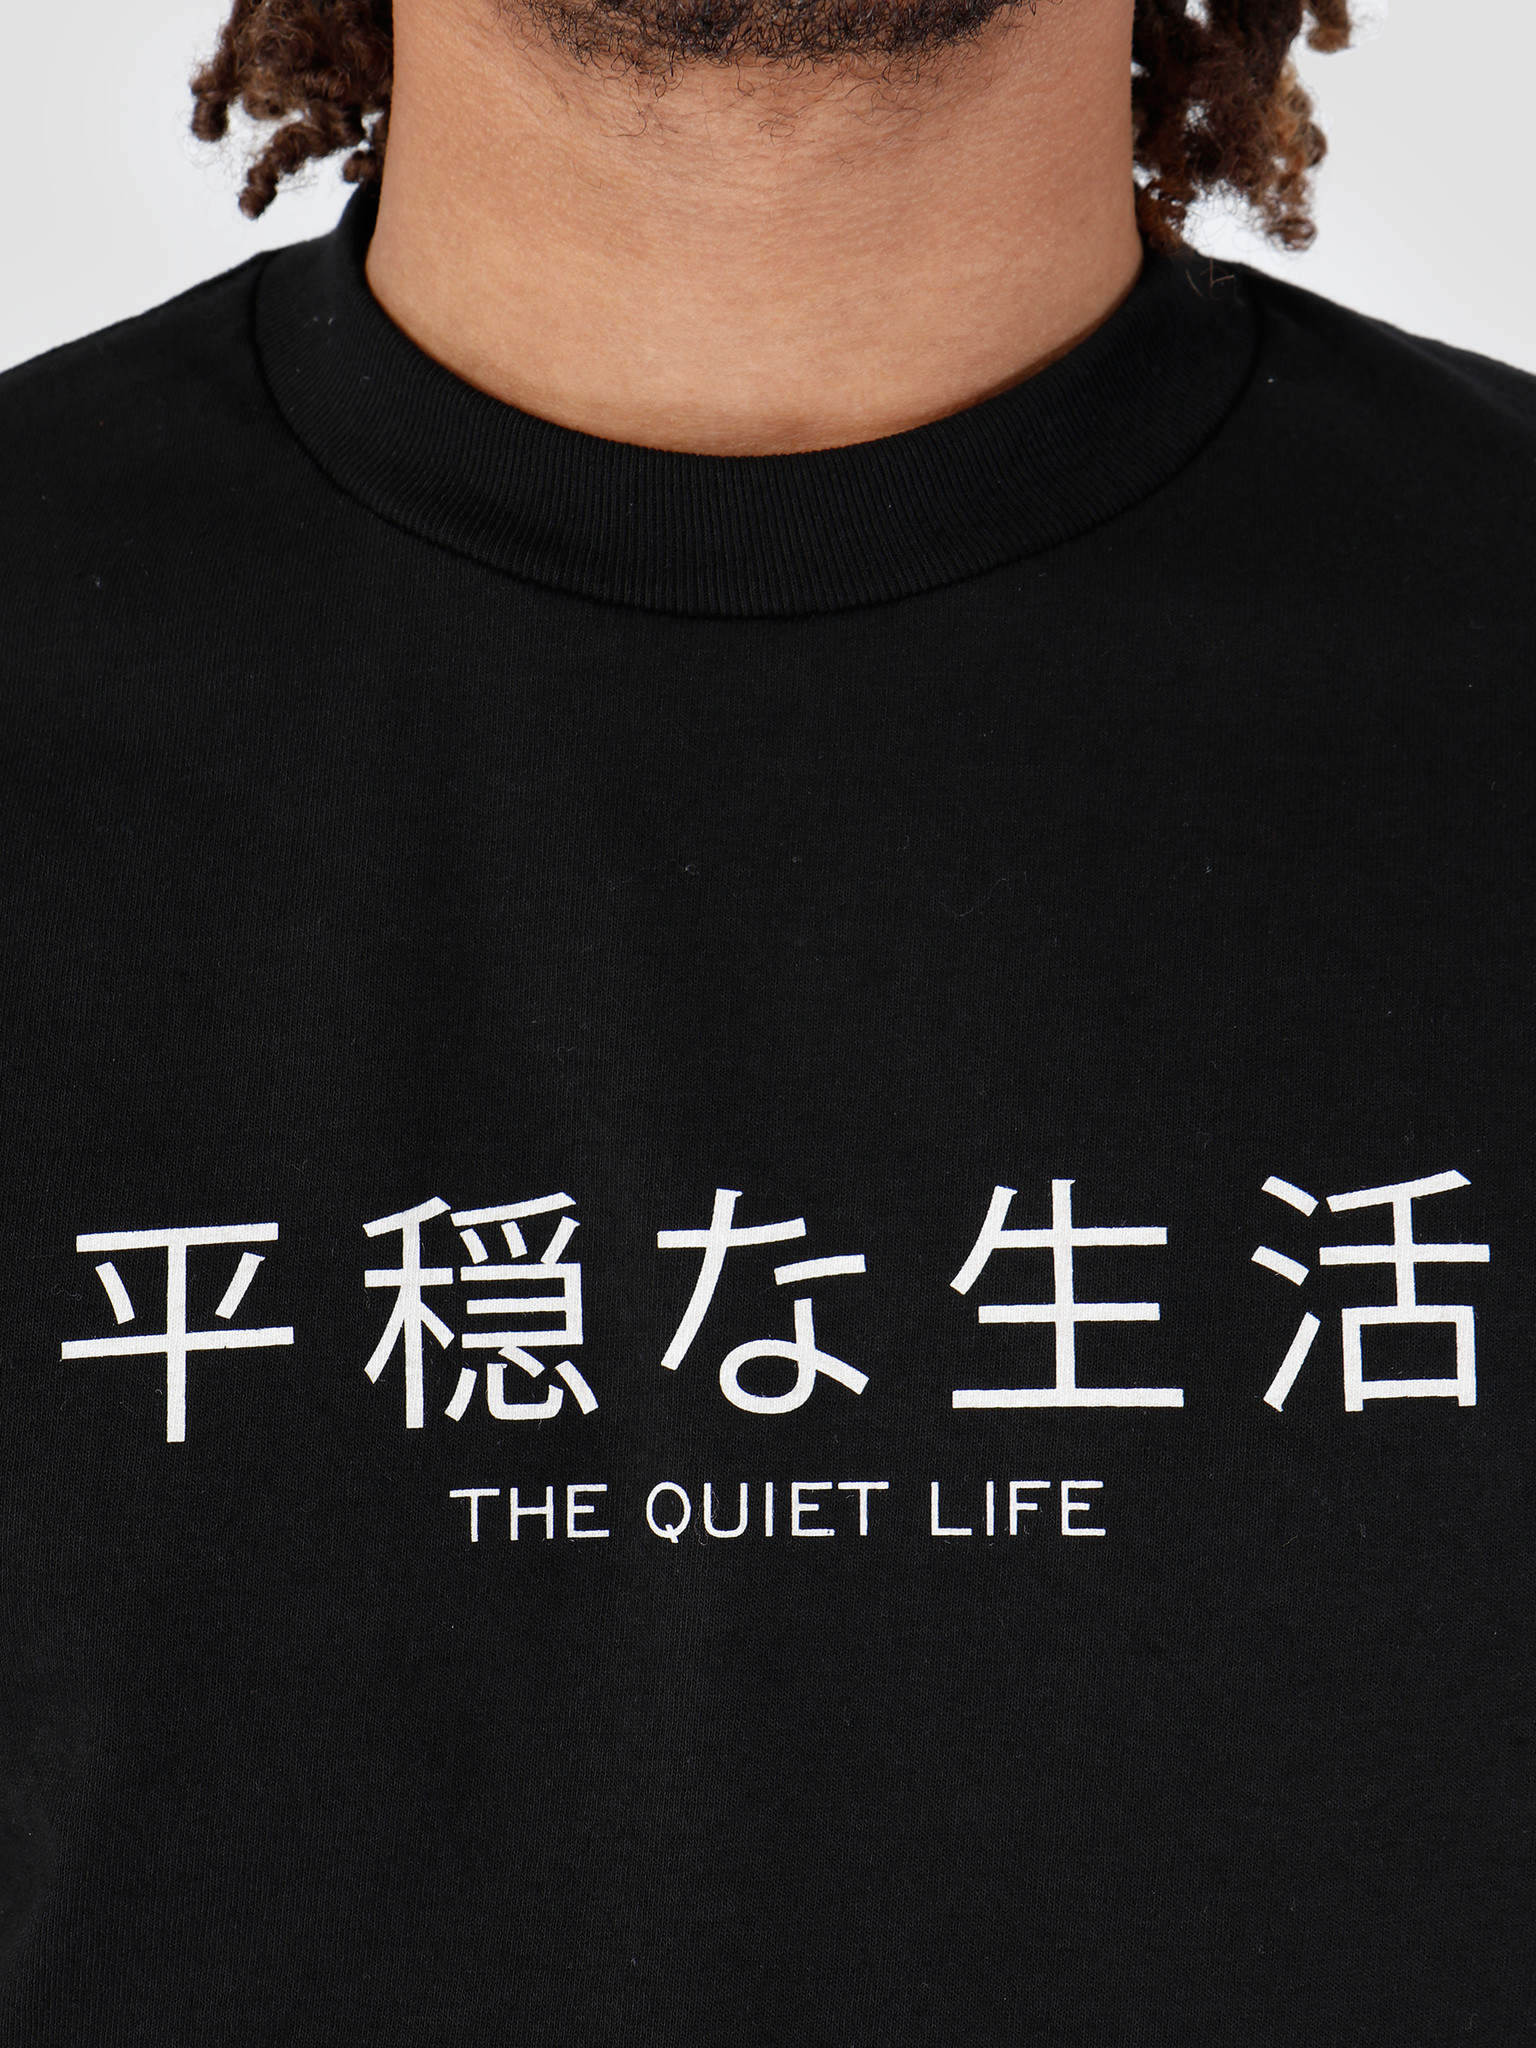 The Quiet Life The Quiet Life Japan T-Shirt Black 19SPD2-2166-BLK